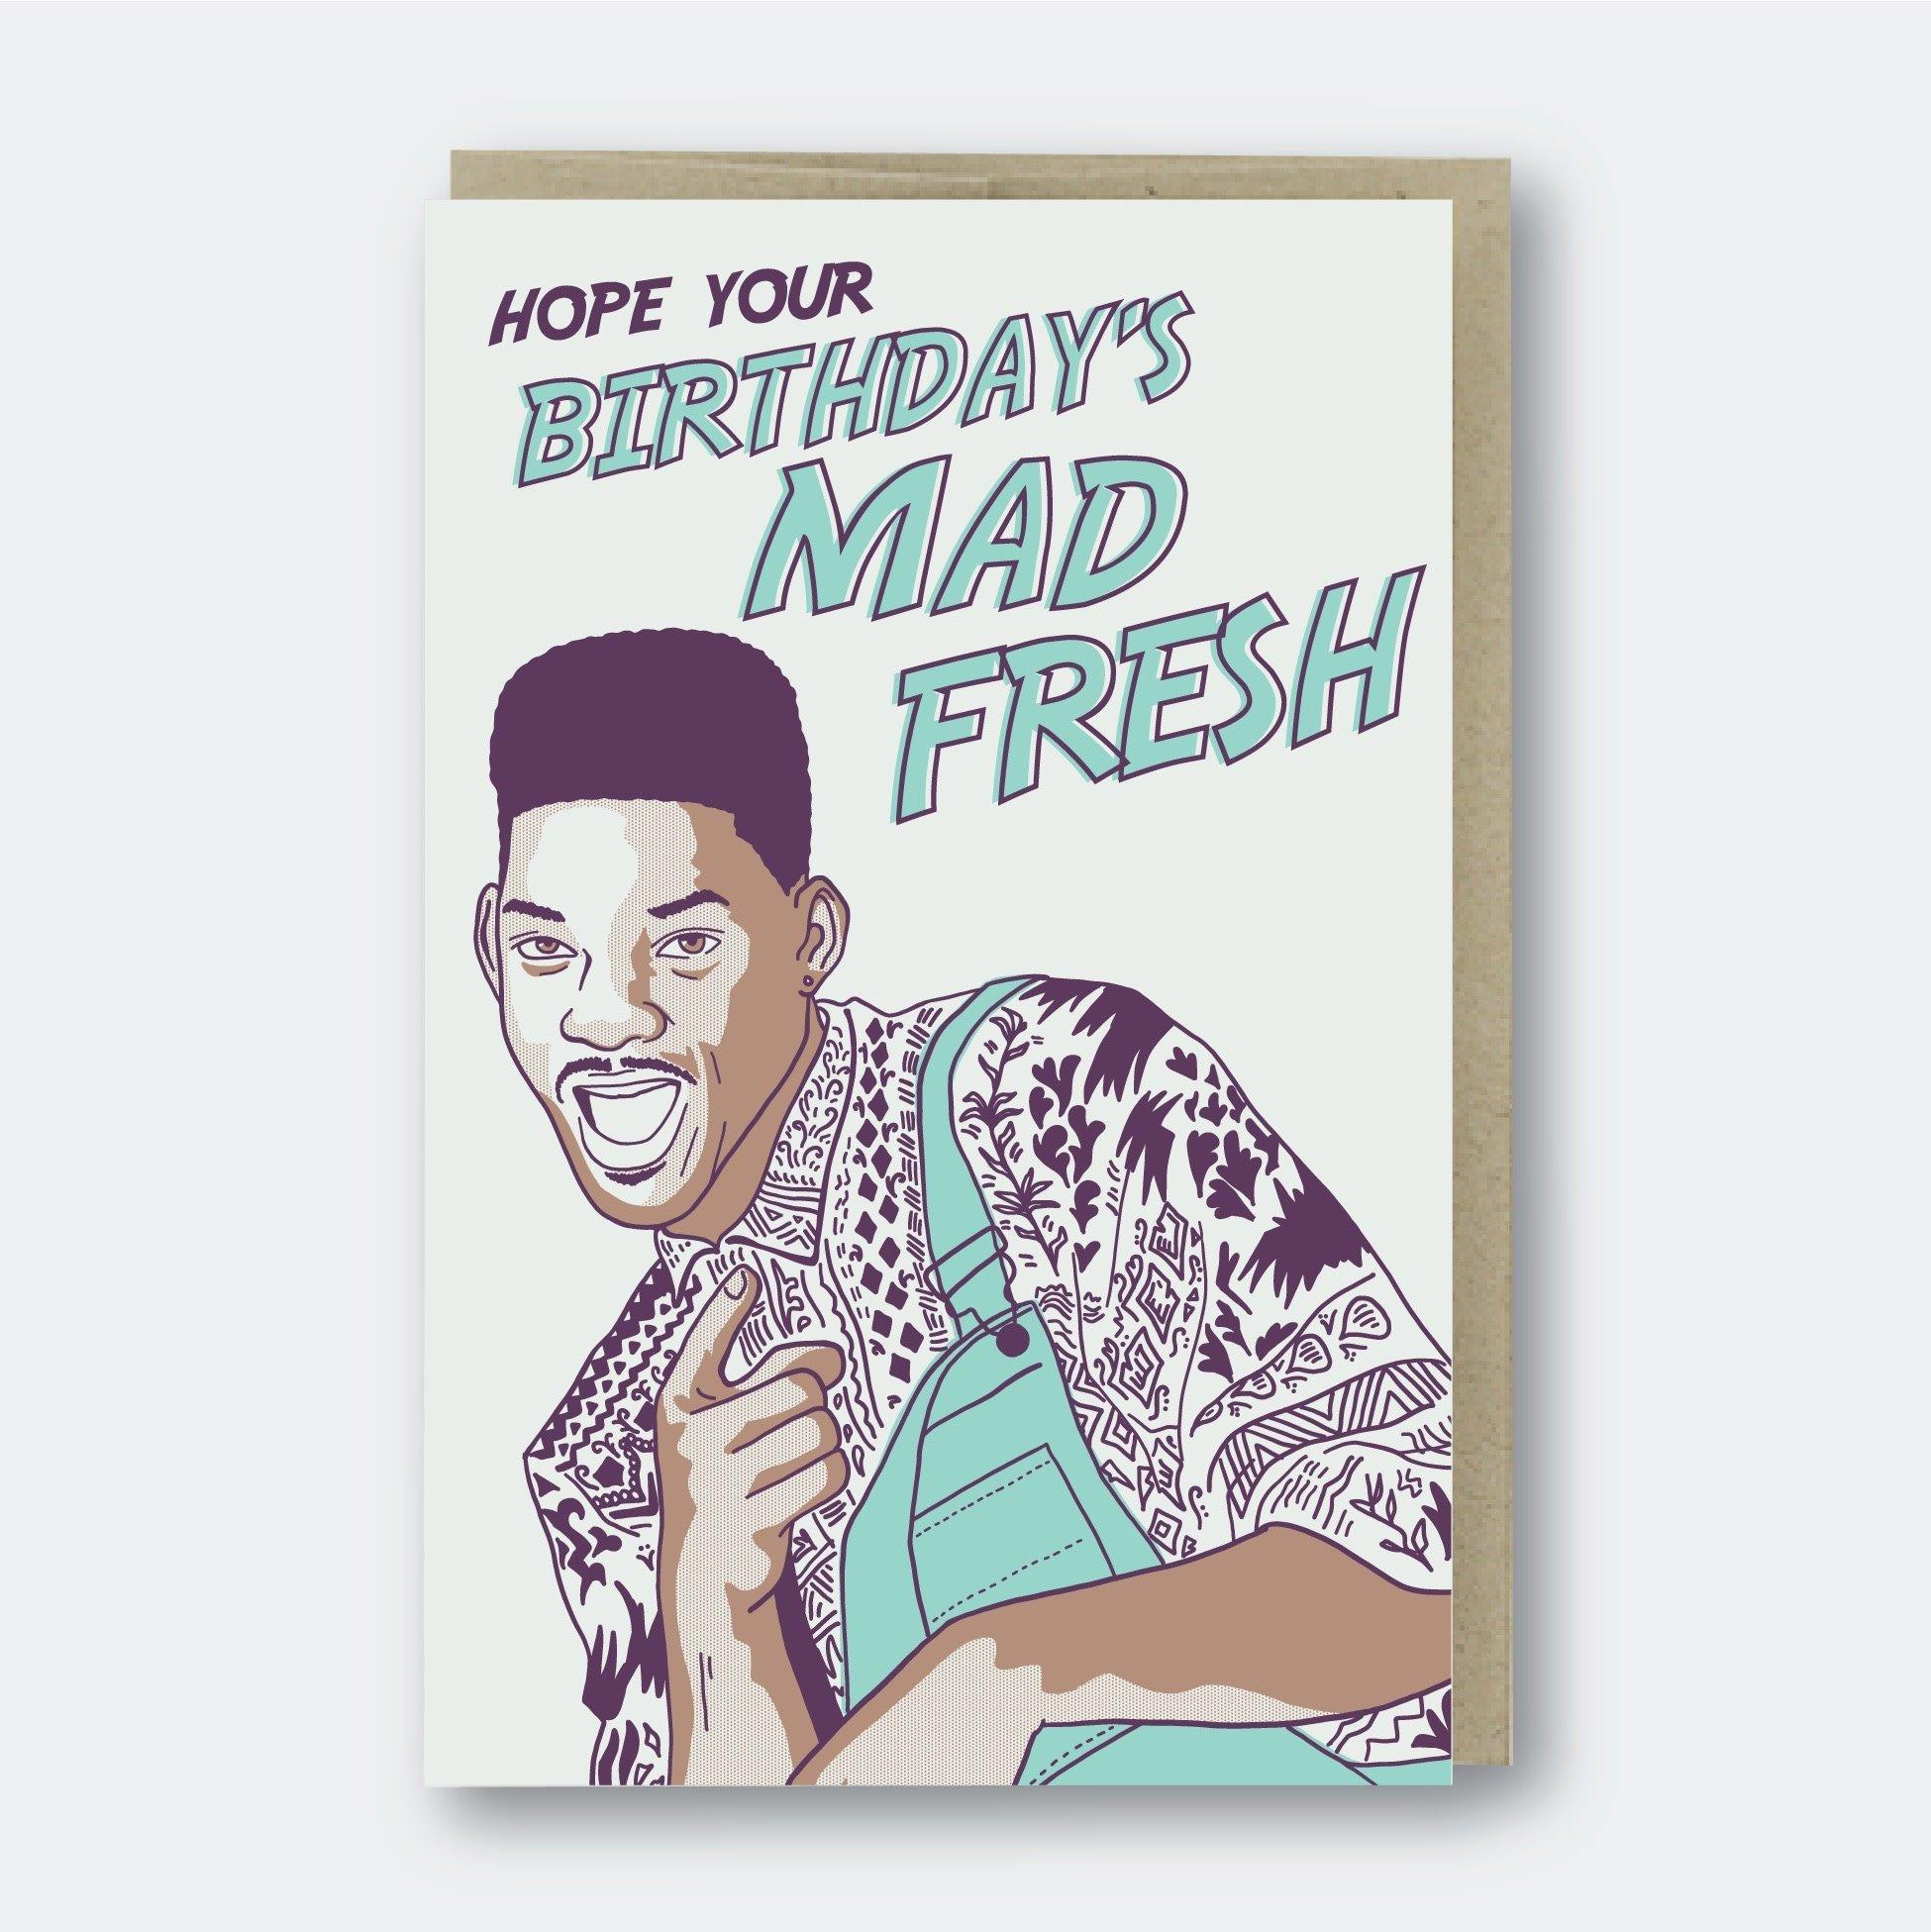 Pike Street Press - PSP Mad Fresh, Fresh Prince Birthday Card